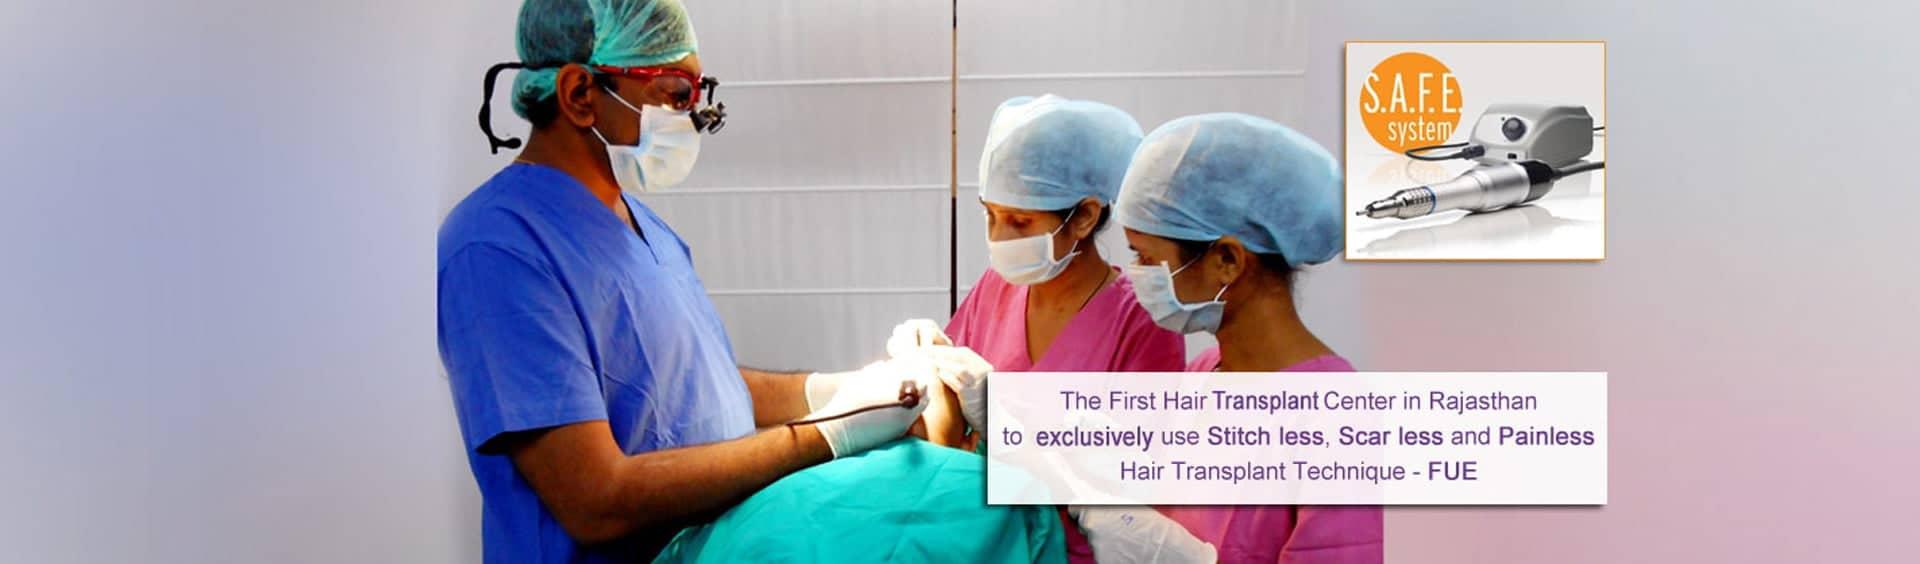 Best Hair Transplant Amp Laser Skin Clinic In Jaipur Rajasthan